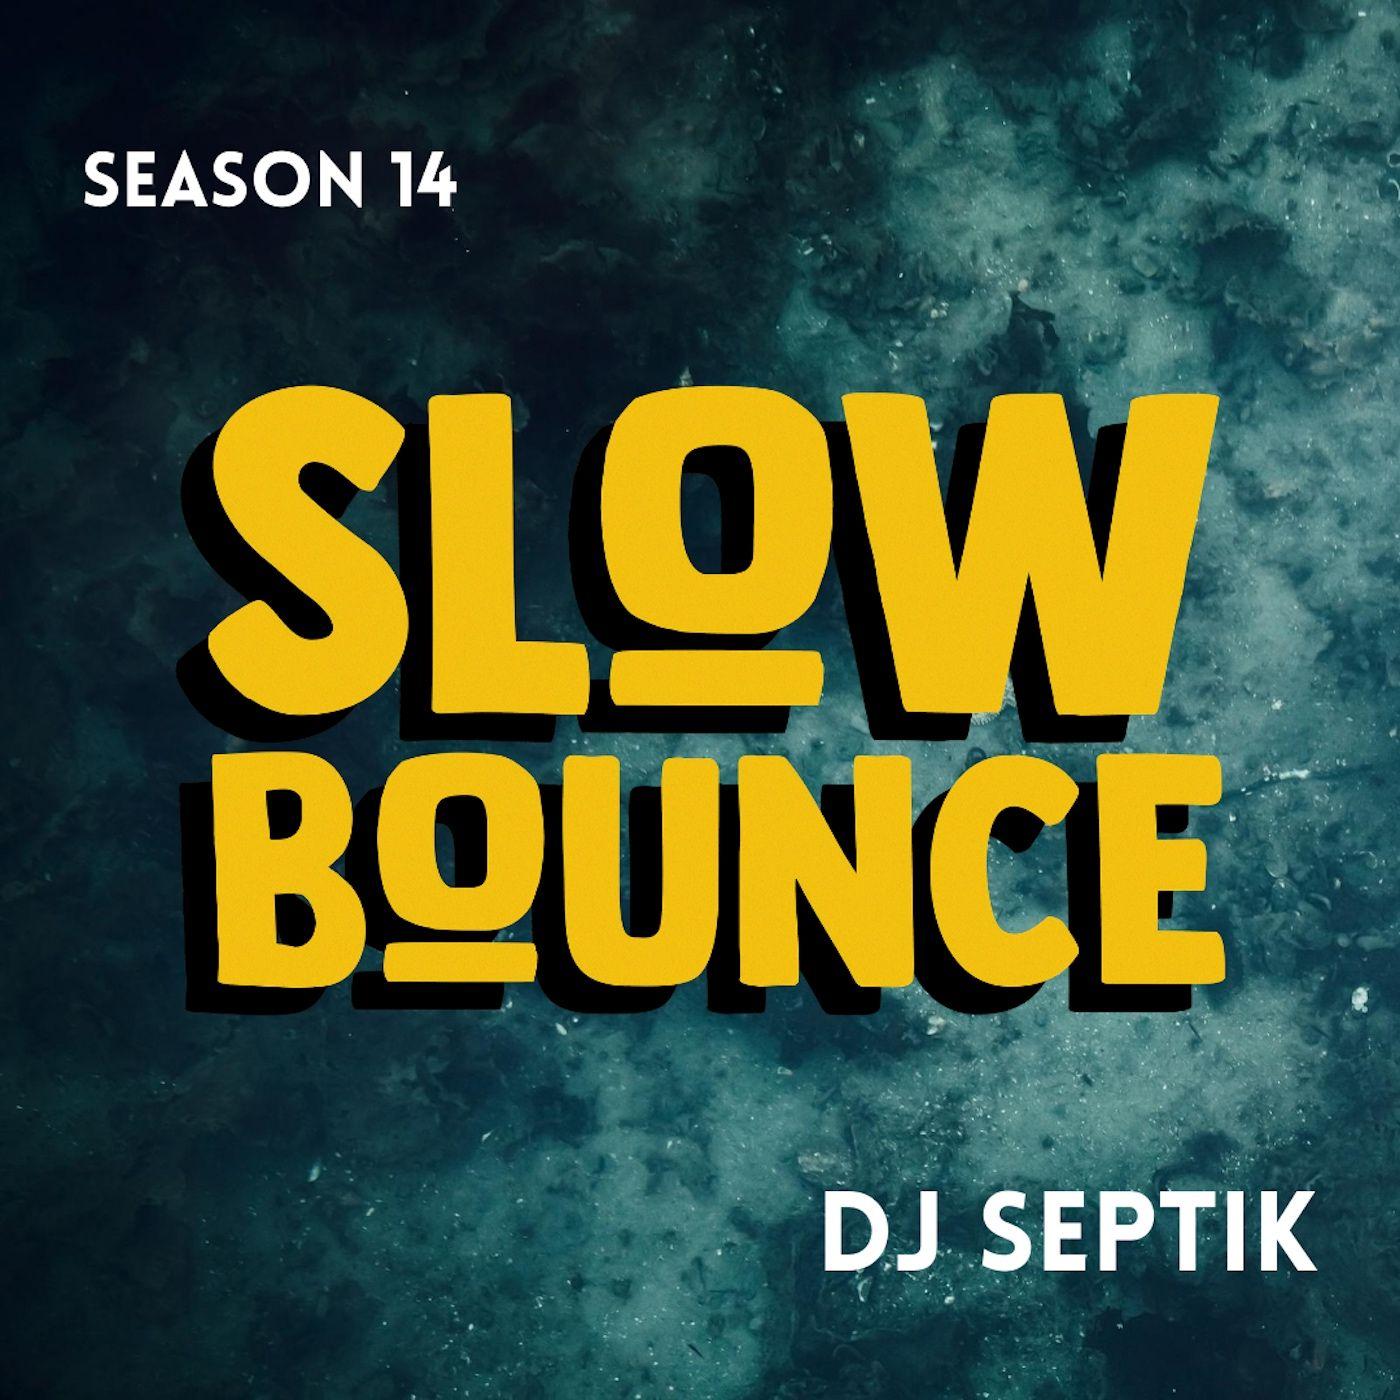 SLOWBOUNCE   Dancehall, Moombahton, Reggae   Dj Septik